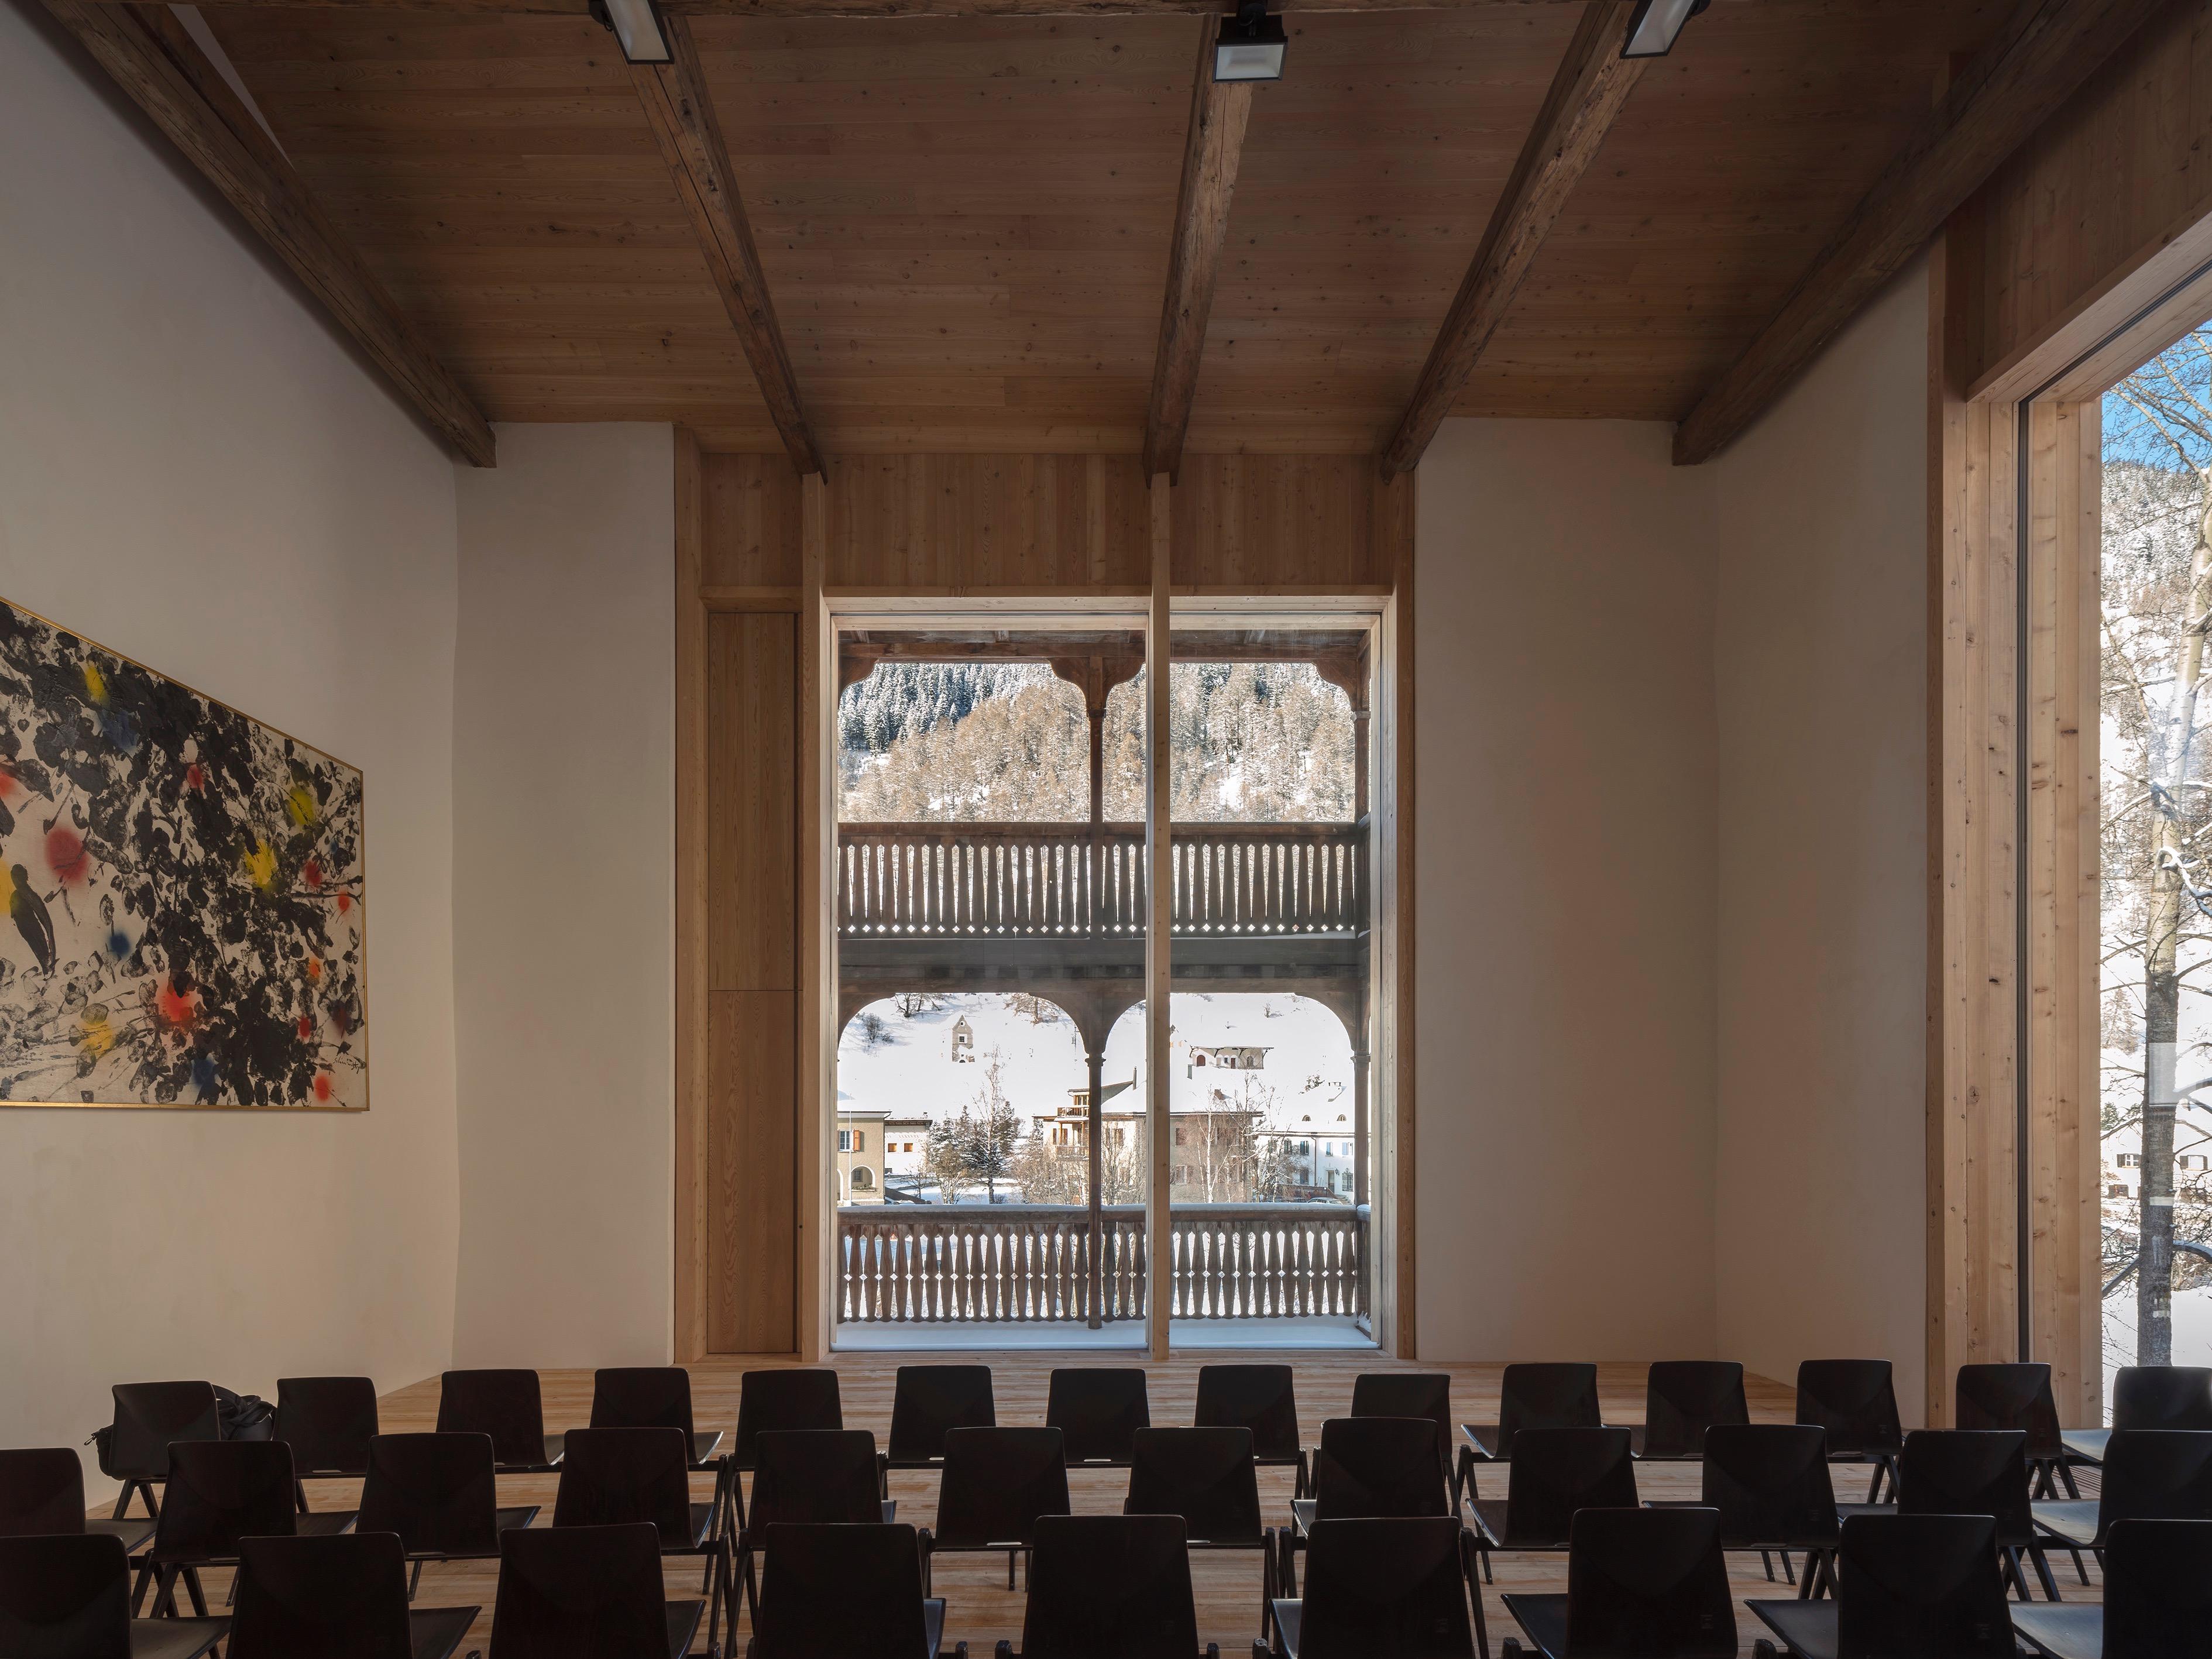 Studio Stefano Graziani, courtesy Muzeum Susch, Art Stations Foundation